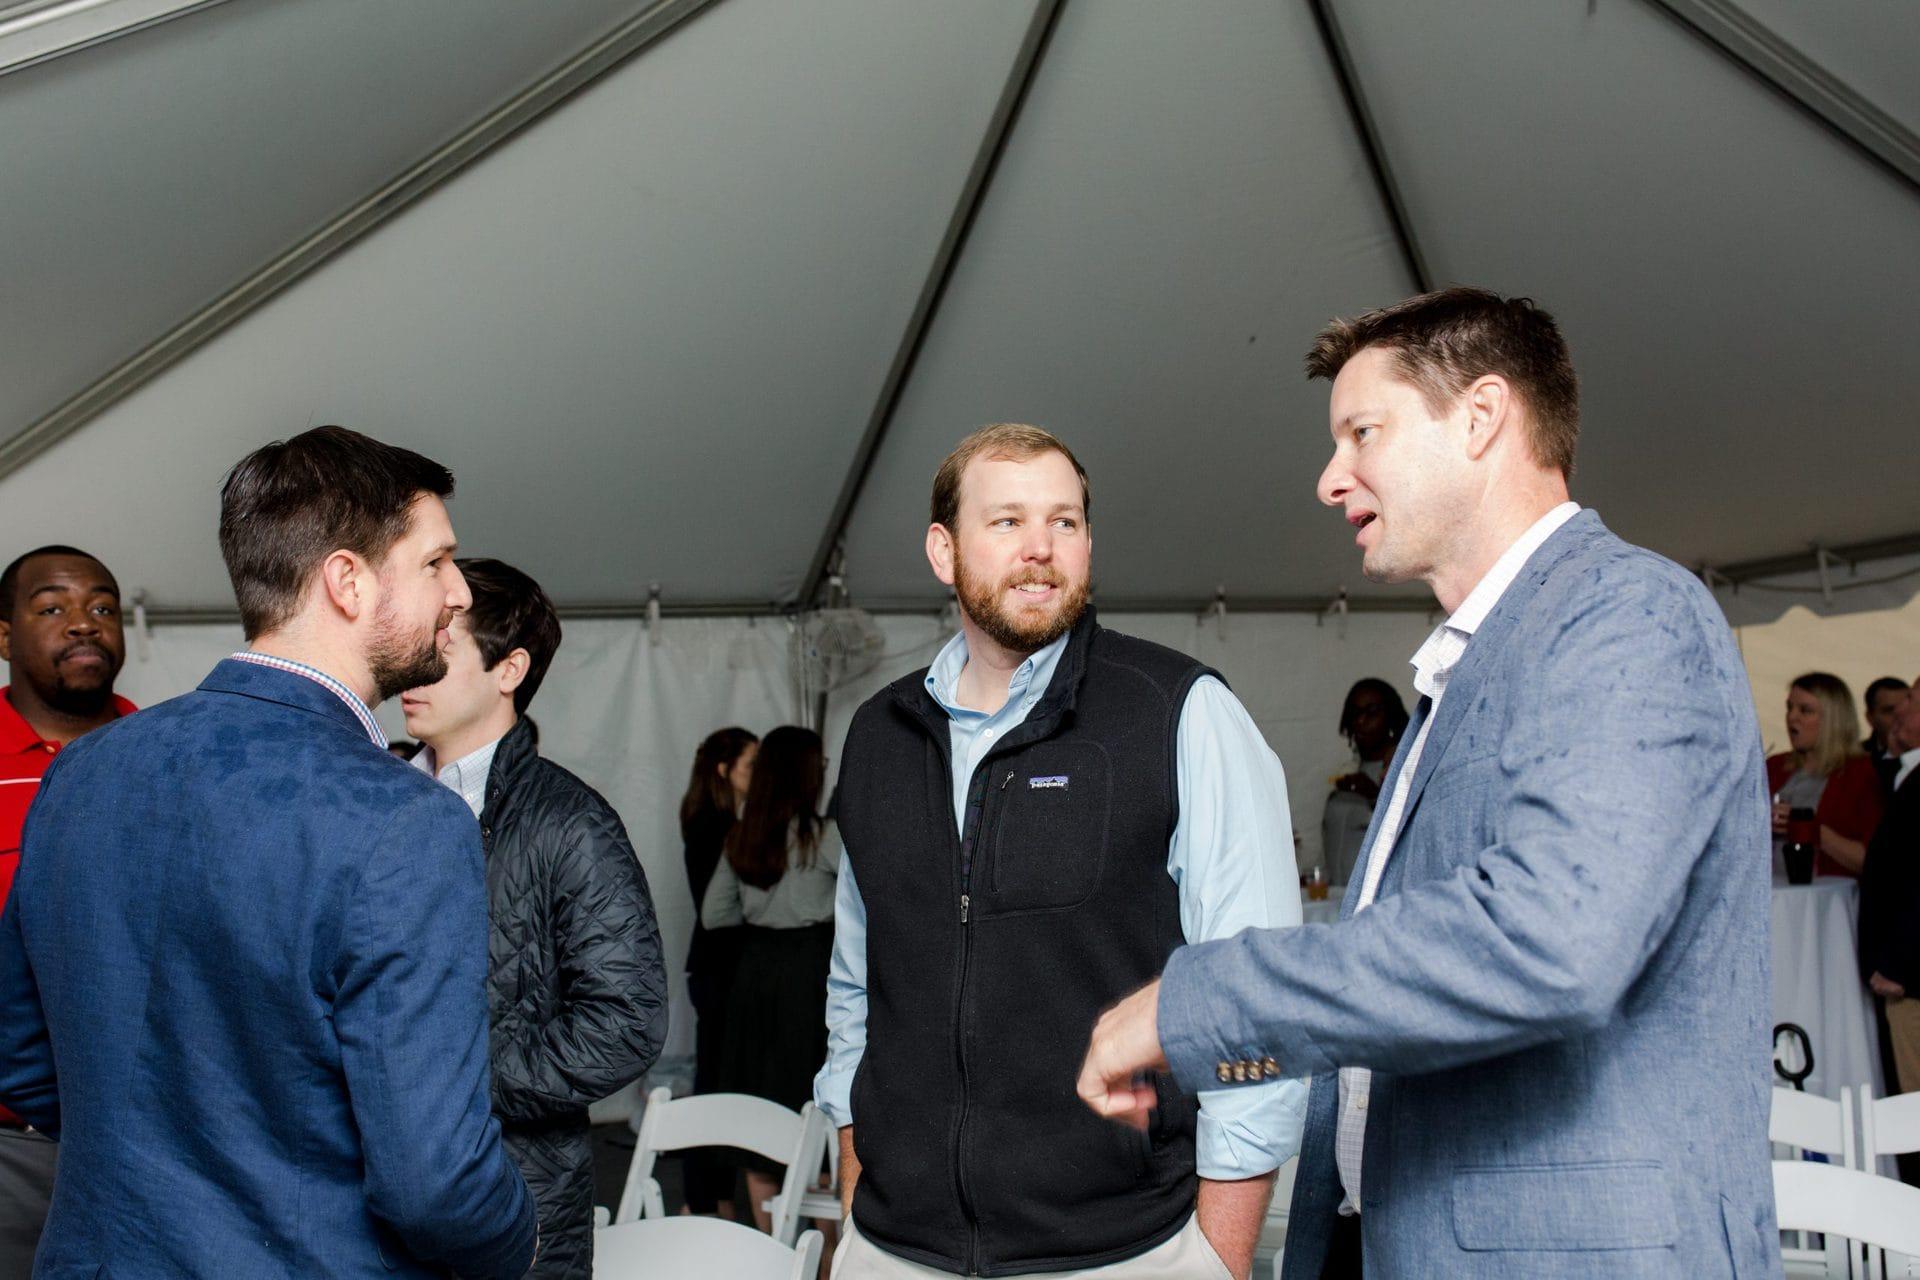 group of men conversation